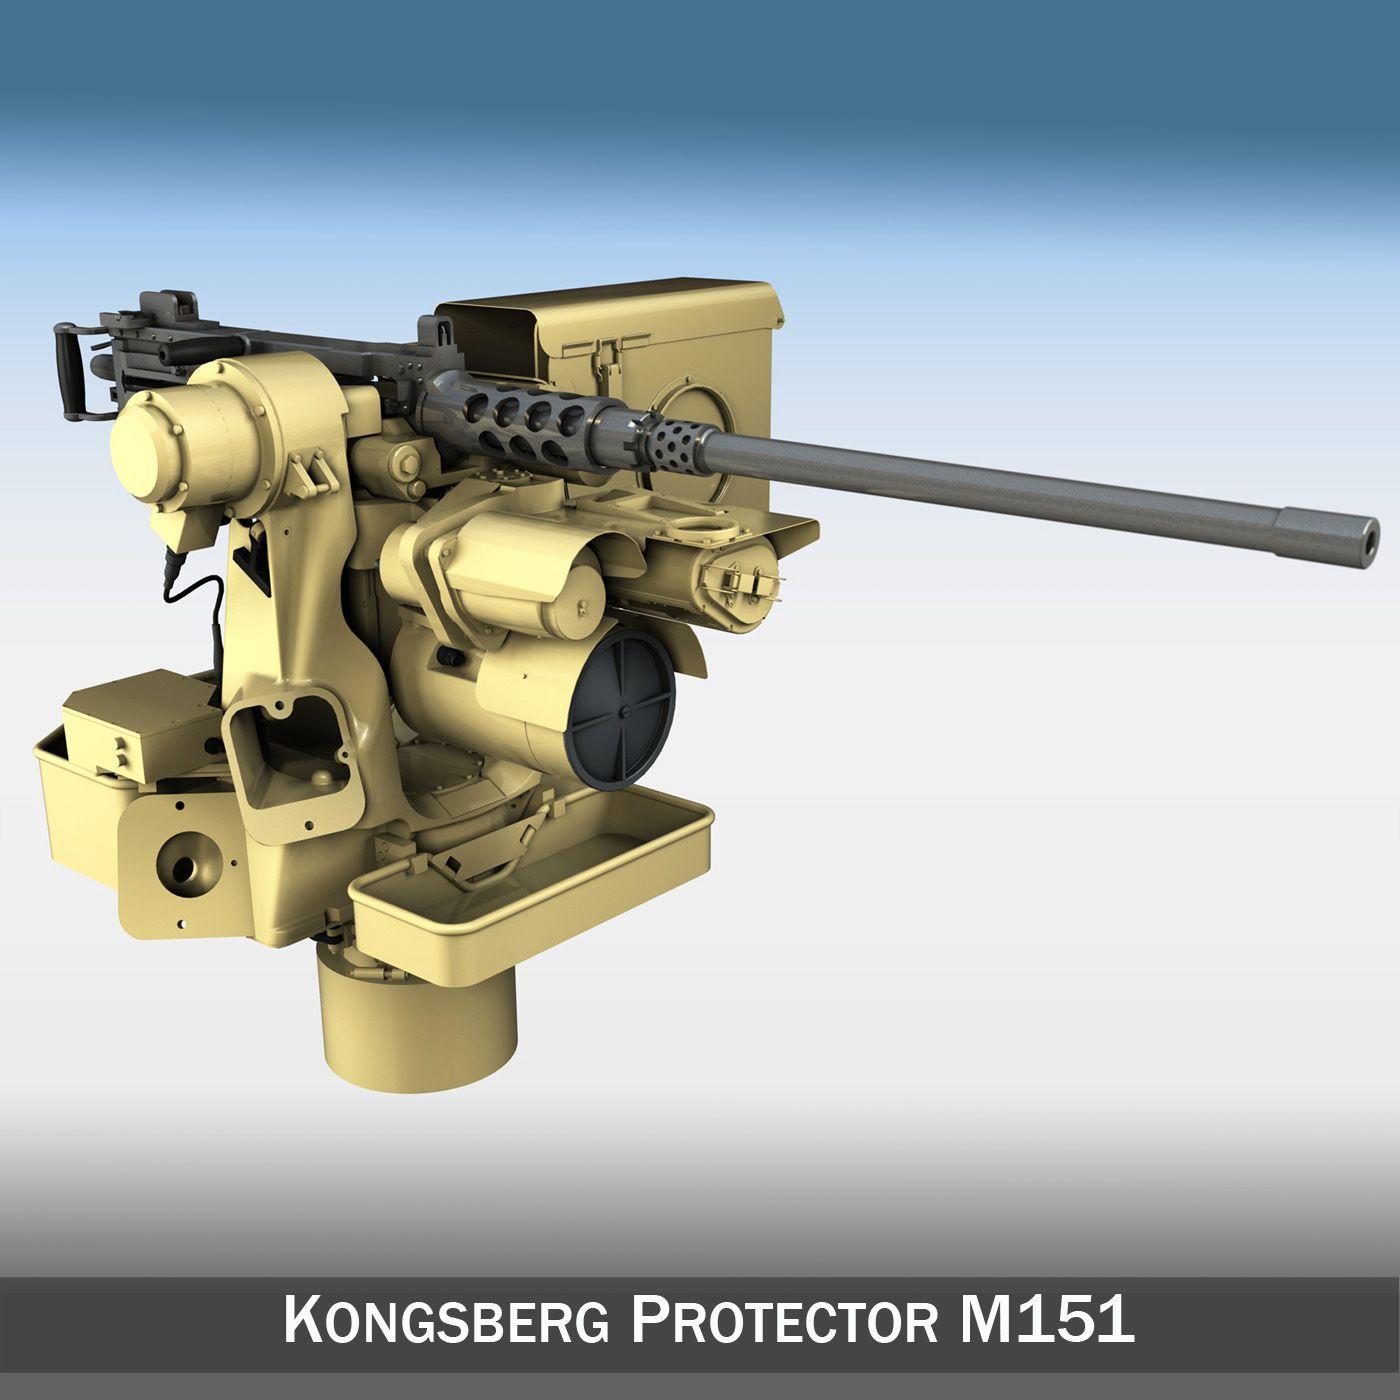 Kongsberg Protector M151 RWS 3D Model- RWS Kongsberg Protector M151